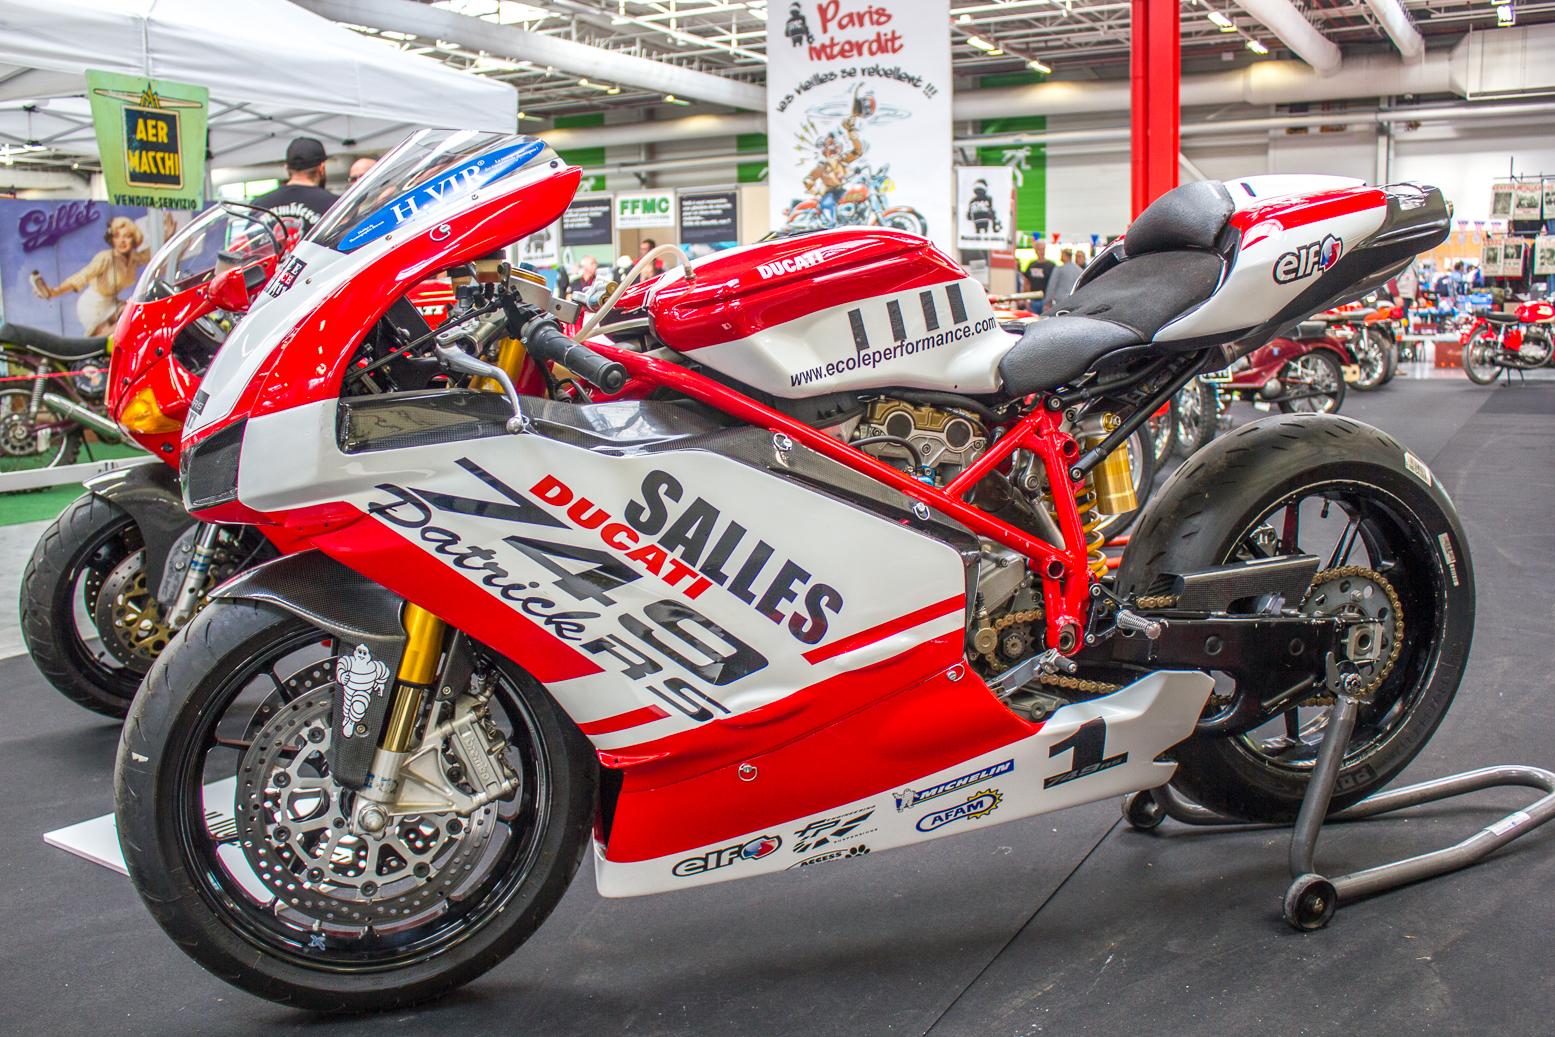 Ducati Performance Club